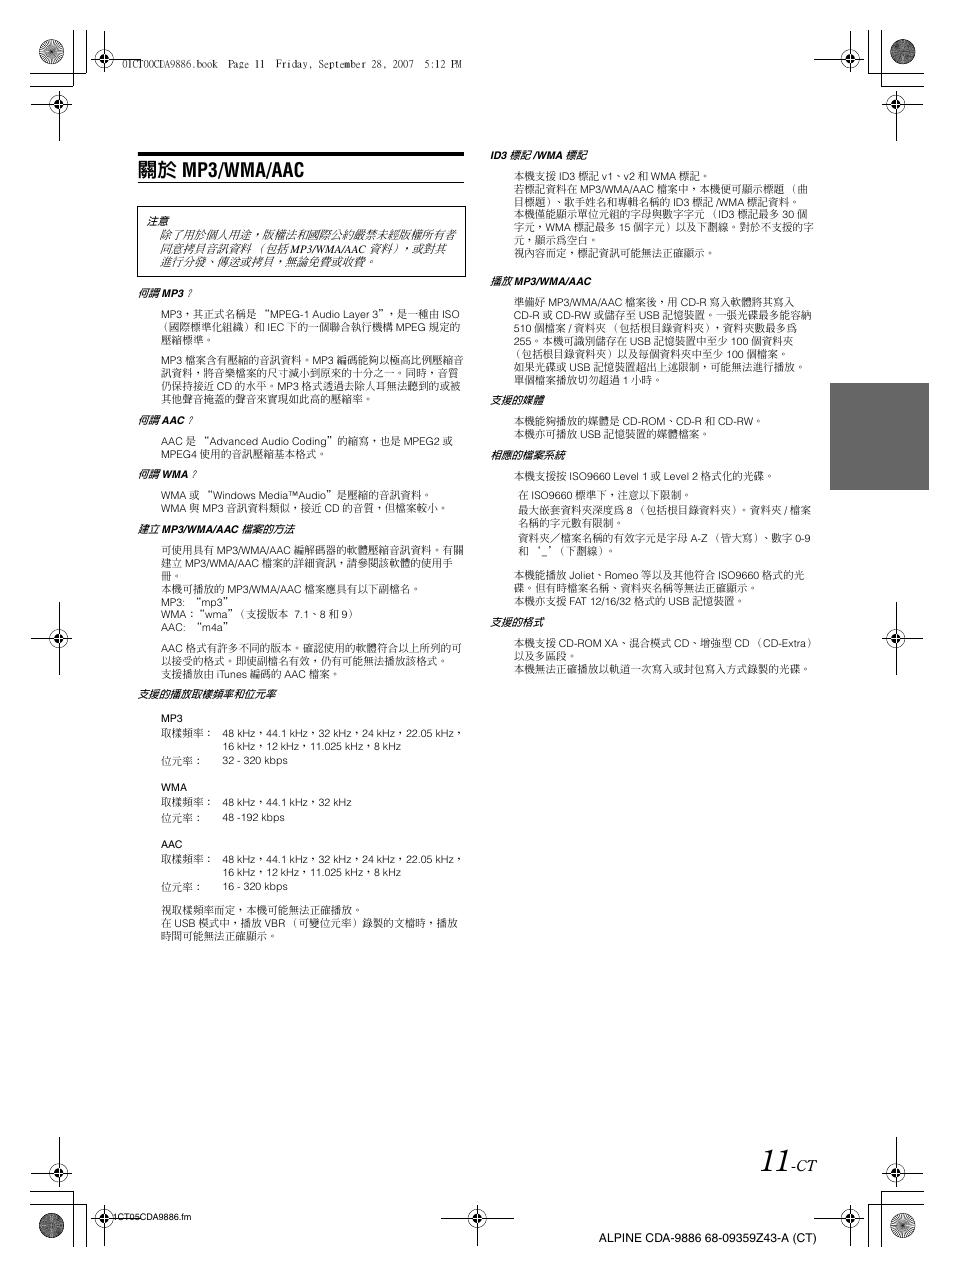 mp3 wma aac alpine cda 9886 user manual page 55 88 rh manualsdir com cda 9886r manual alpine cda-9886 manual en español